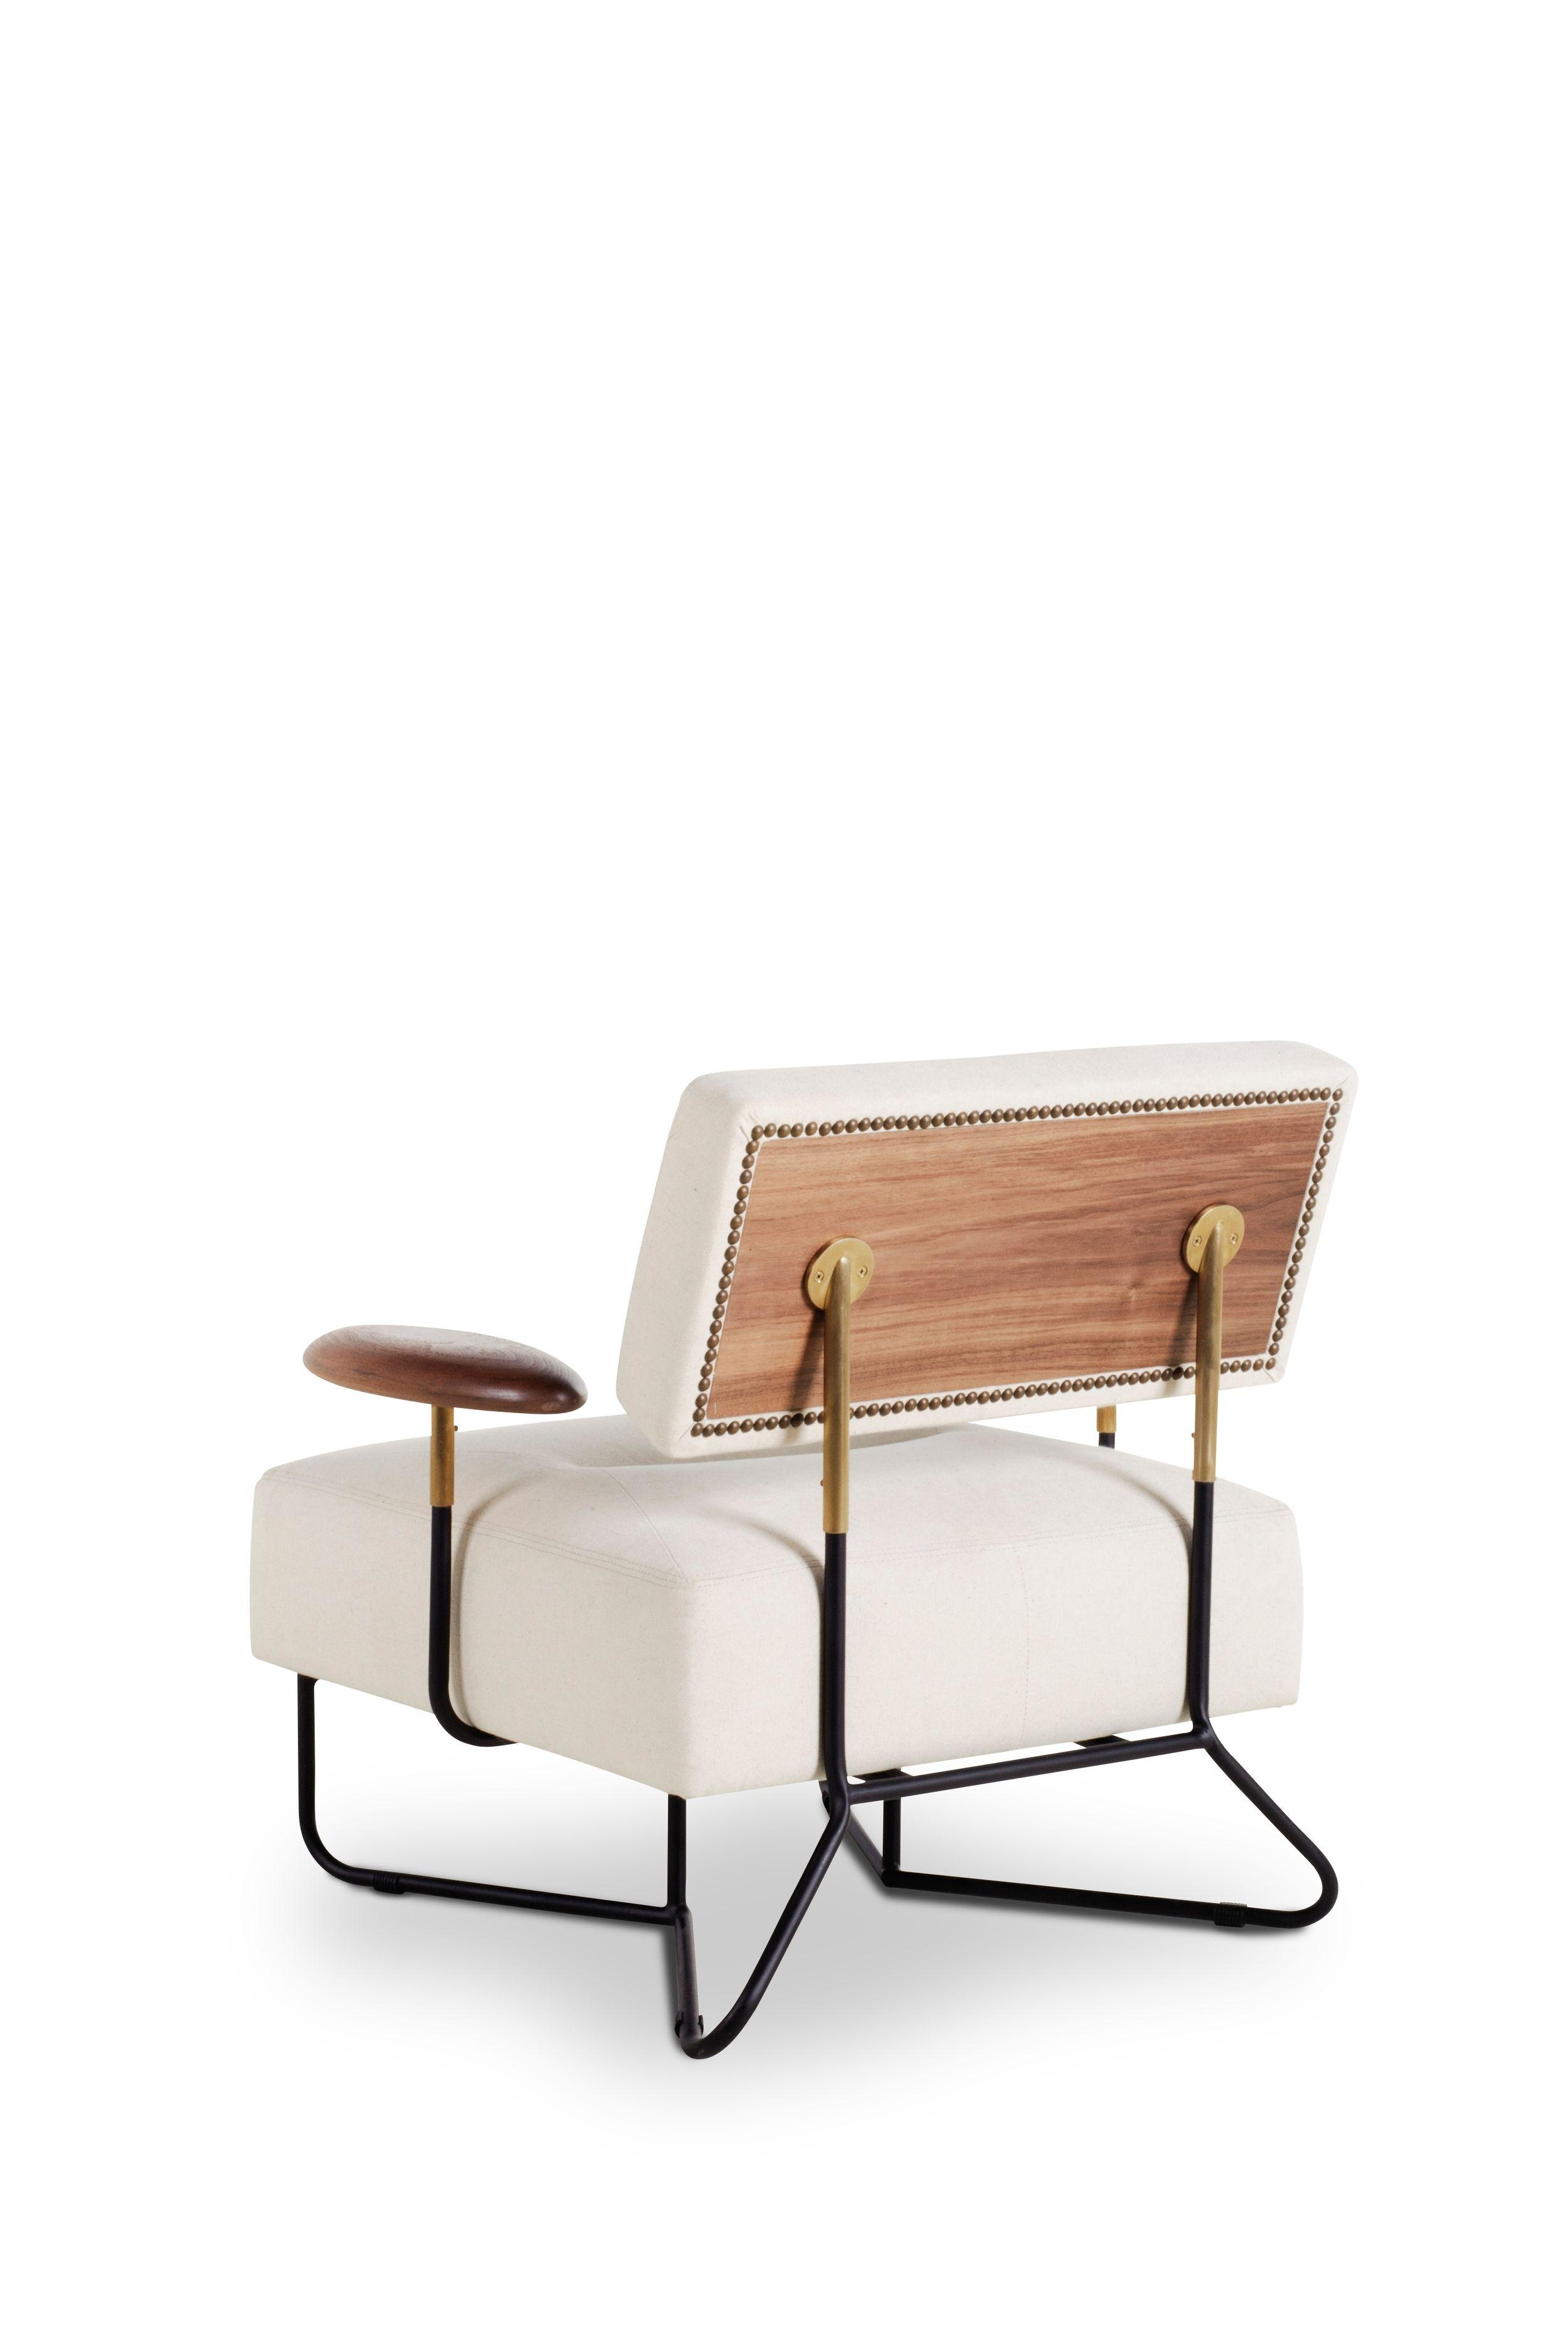 QT CHAIR — ROAM - Scandinavian Design Distributor in 2020